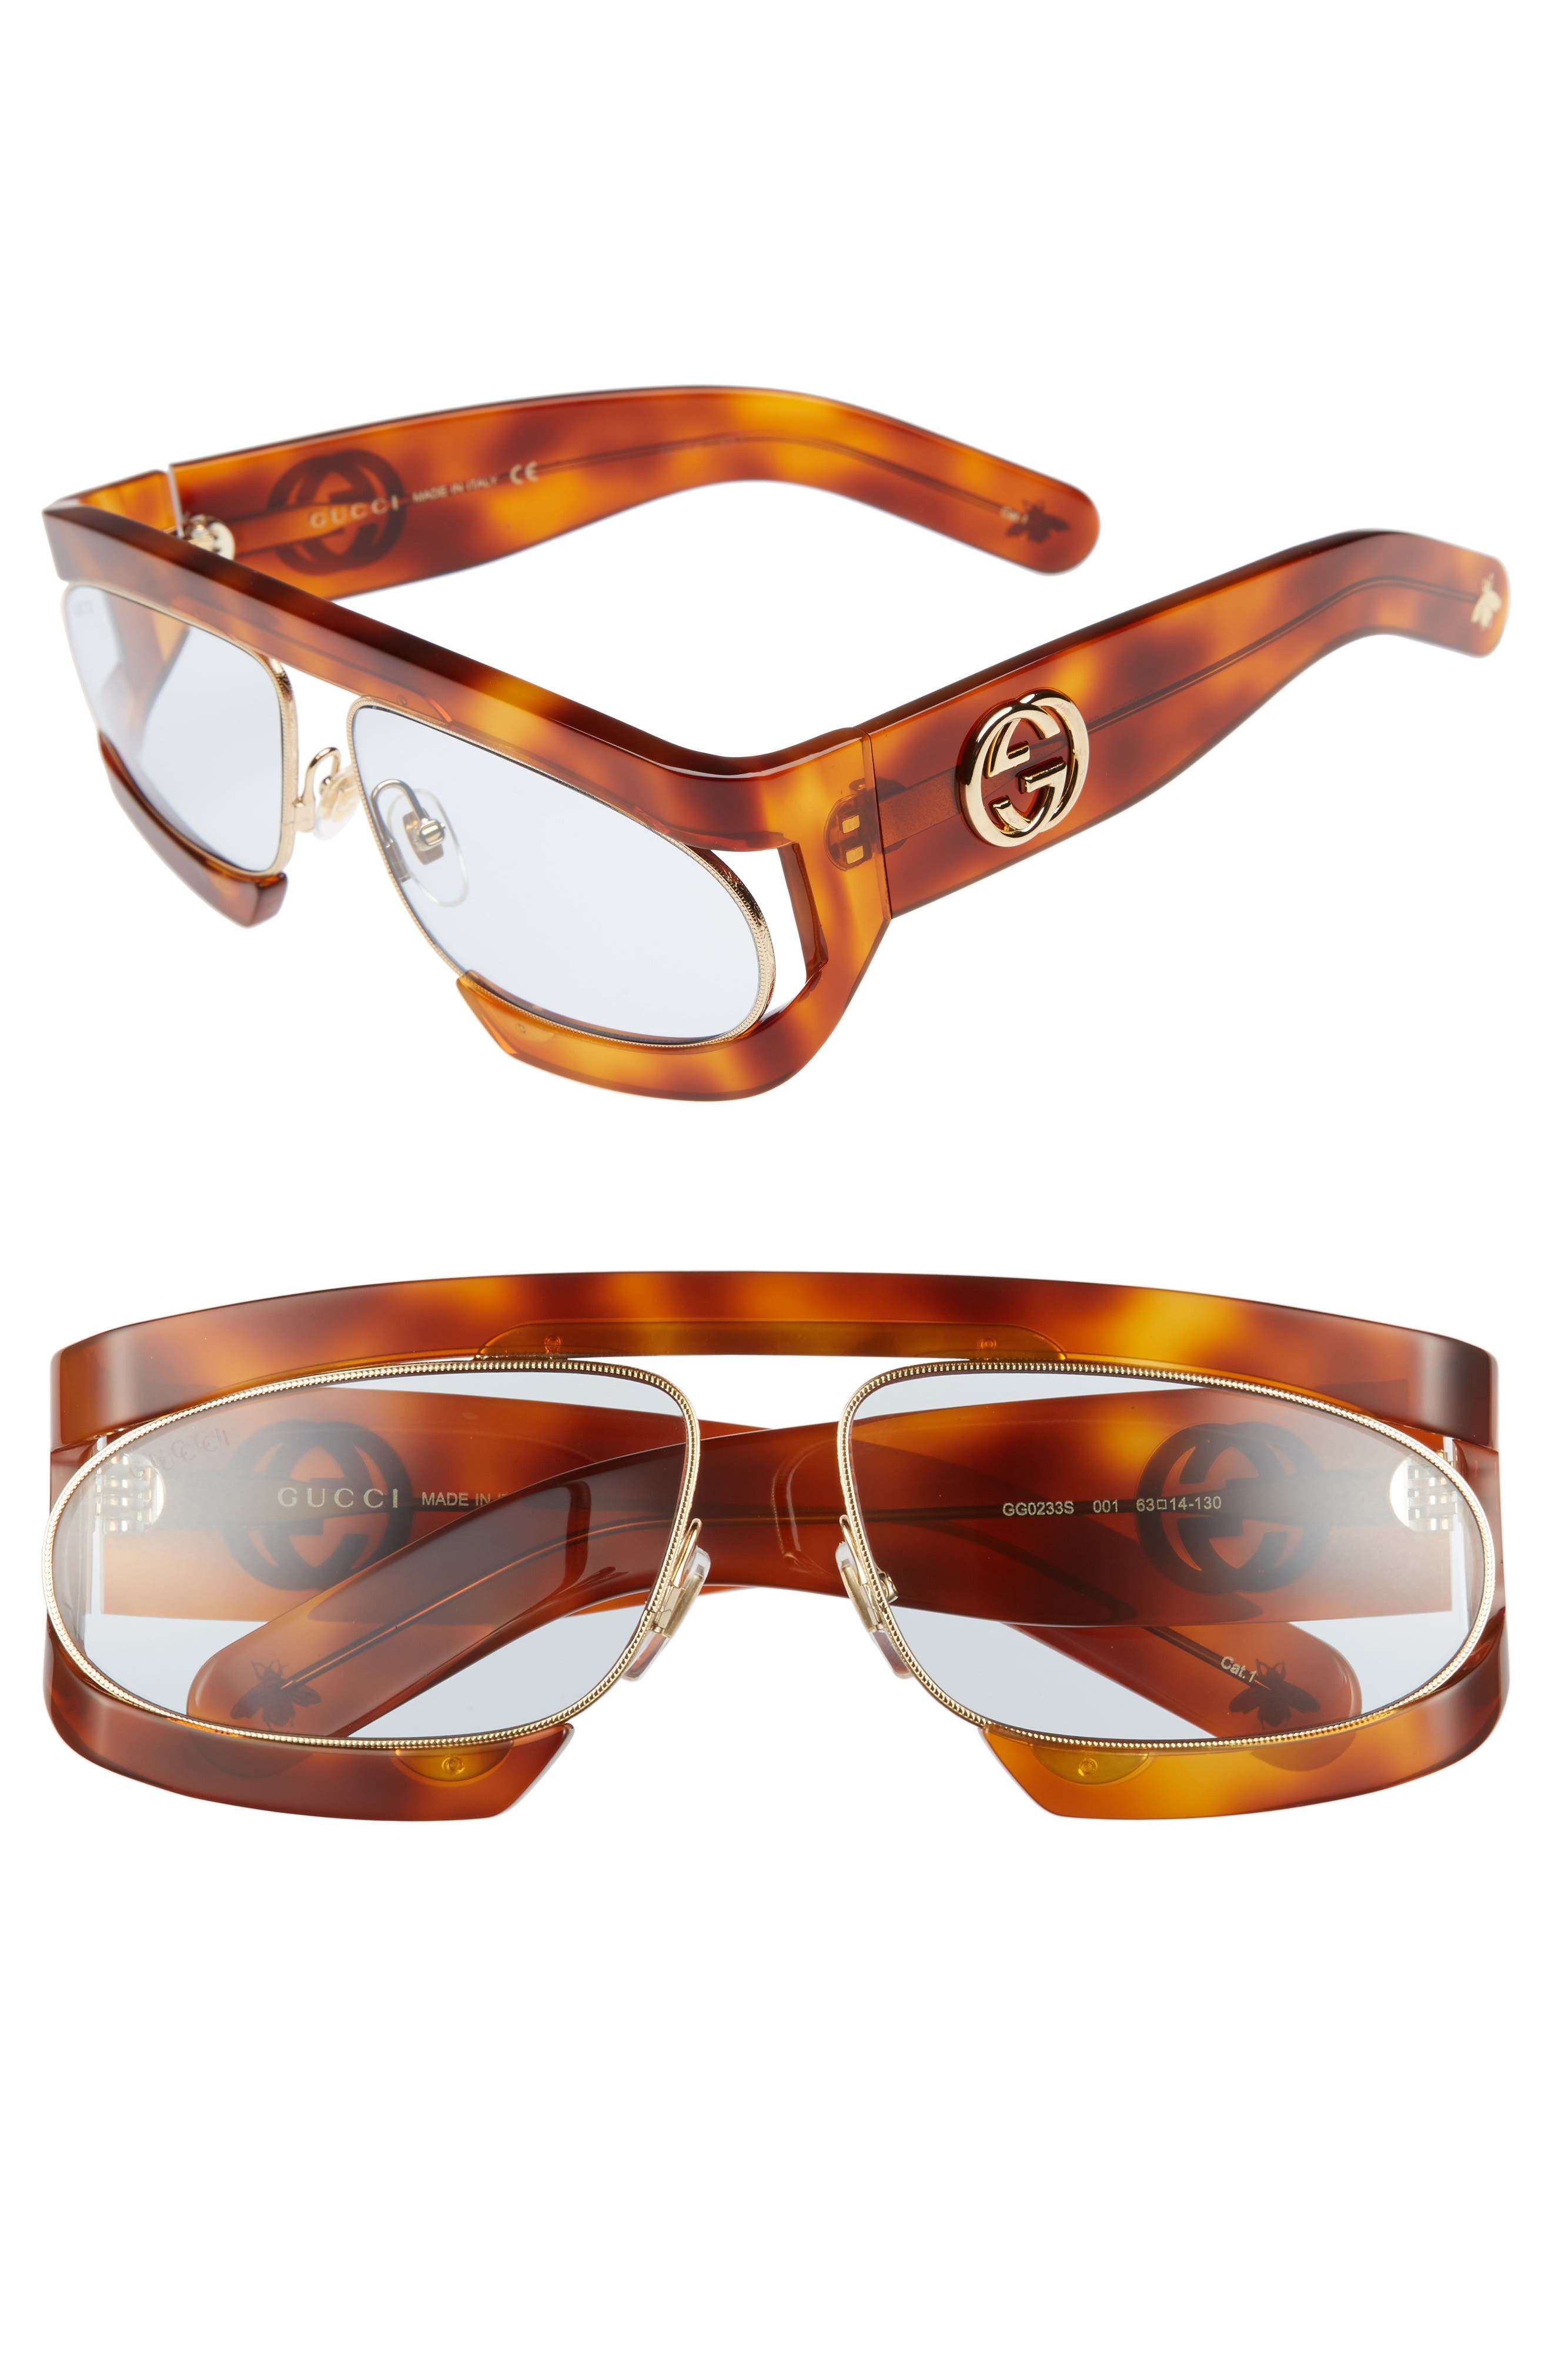 63mm Shield Glasses,                             Main thumbnail 1, color,                             200